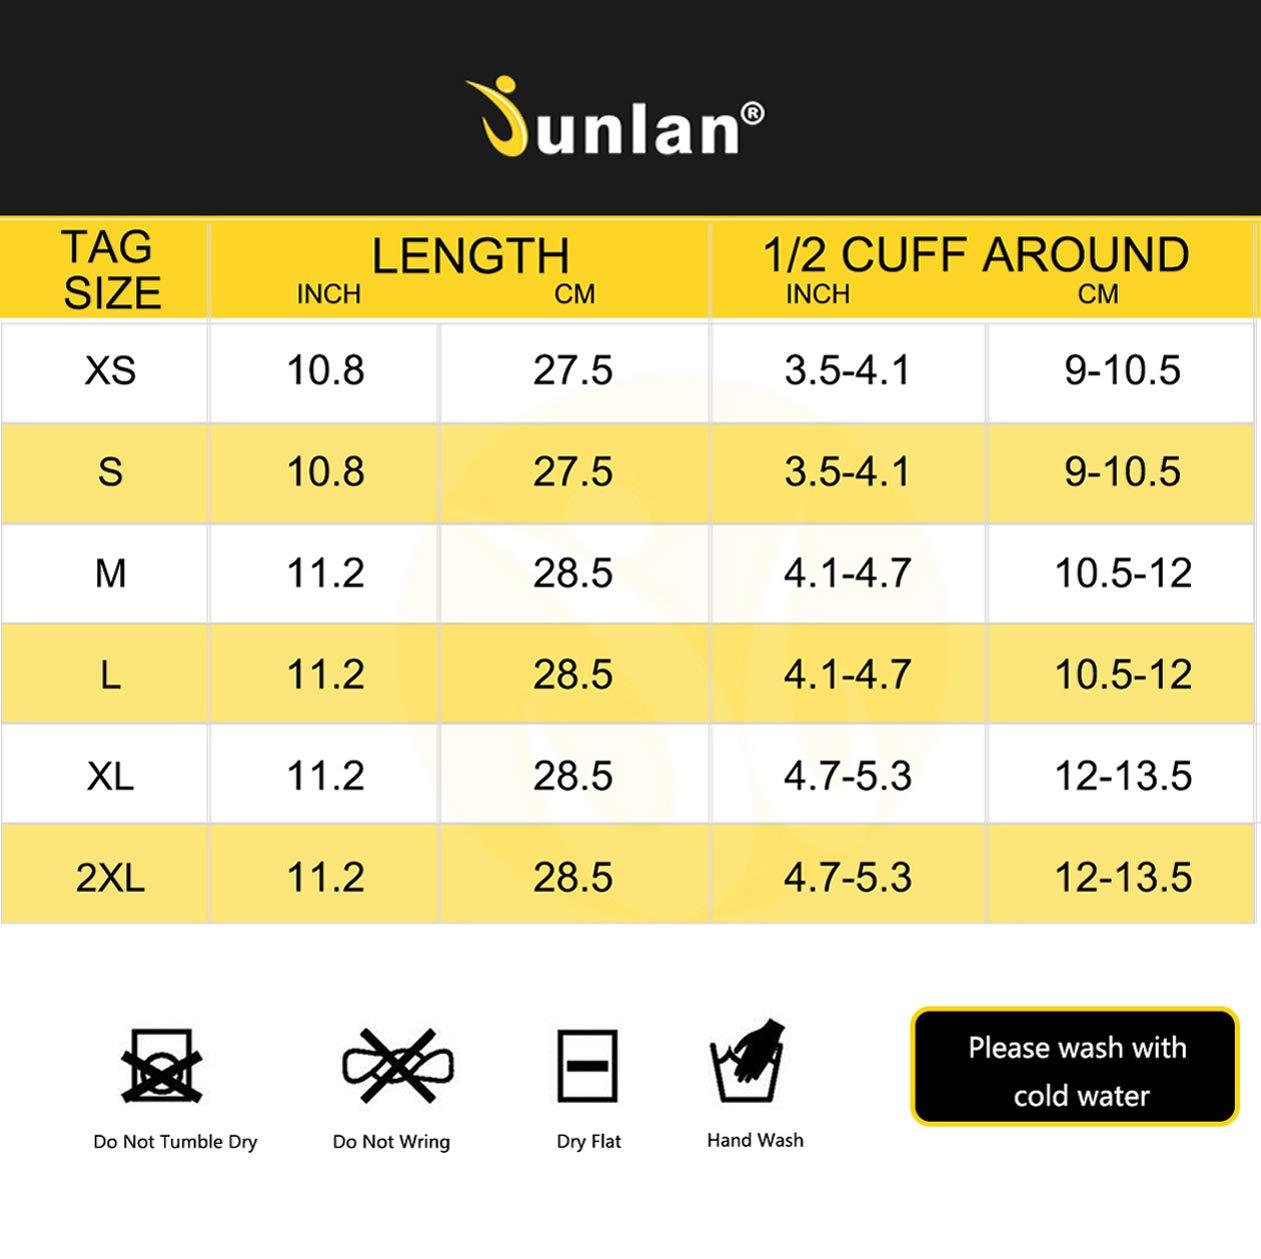 Junlan Neoprene Diving Gloves, Wetsuits Glove for Snorkeling, Kayaking, Water Jet Skiing, Sailing, Scuba Diving, Rafting (Black, XL/2XL) by Junlan